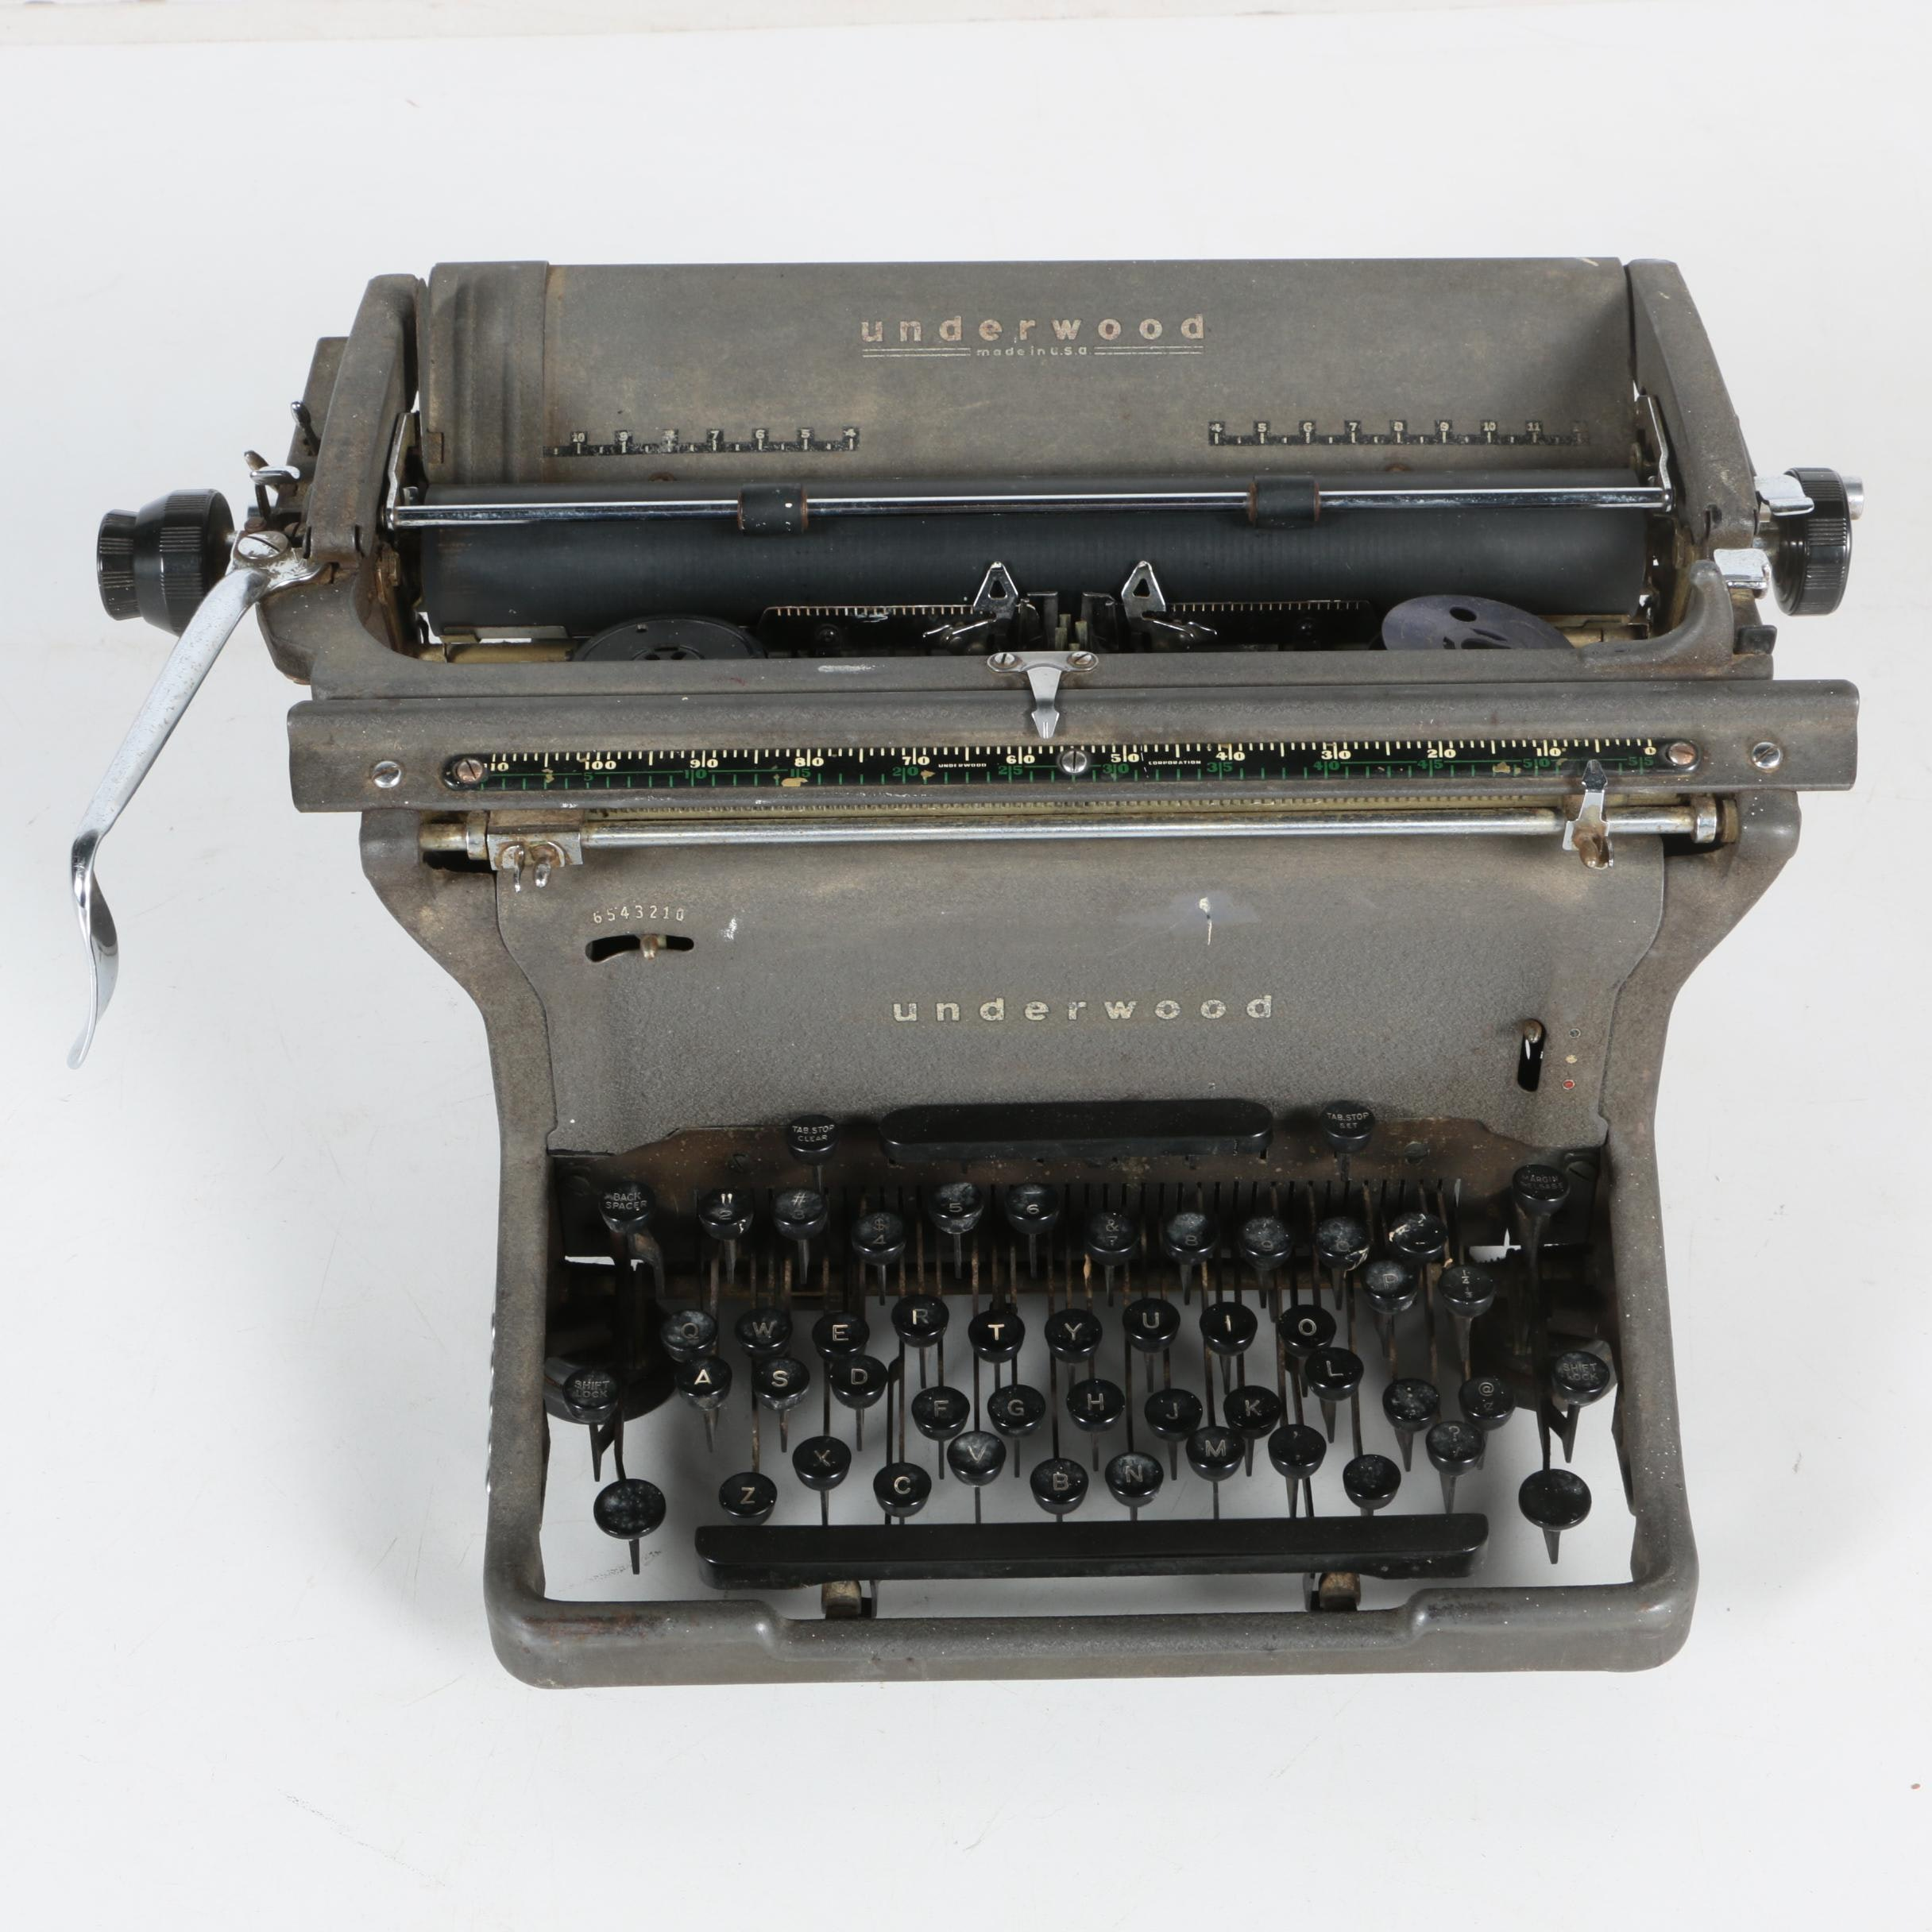 Vintage Underwood Manual Typewriter